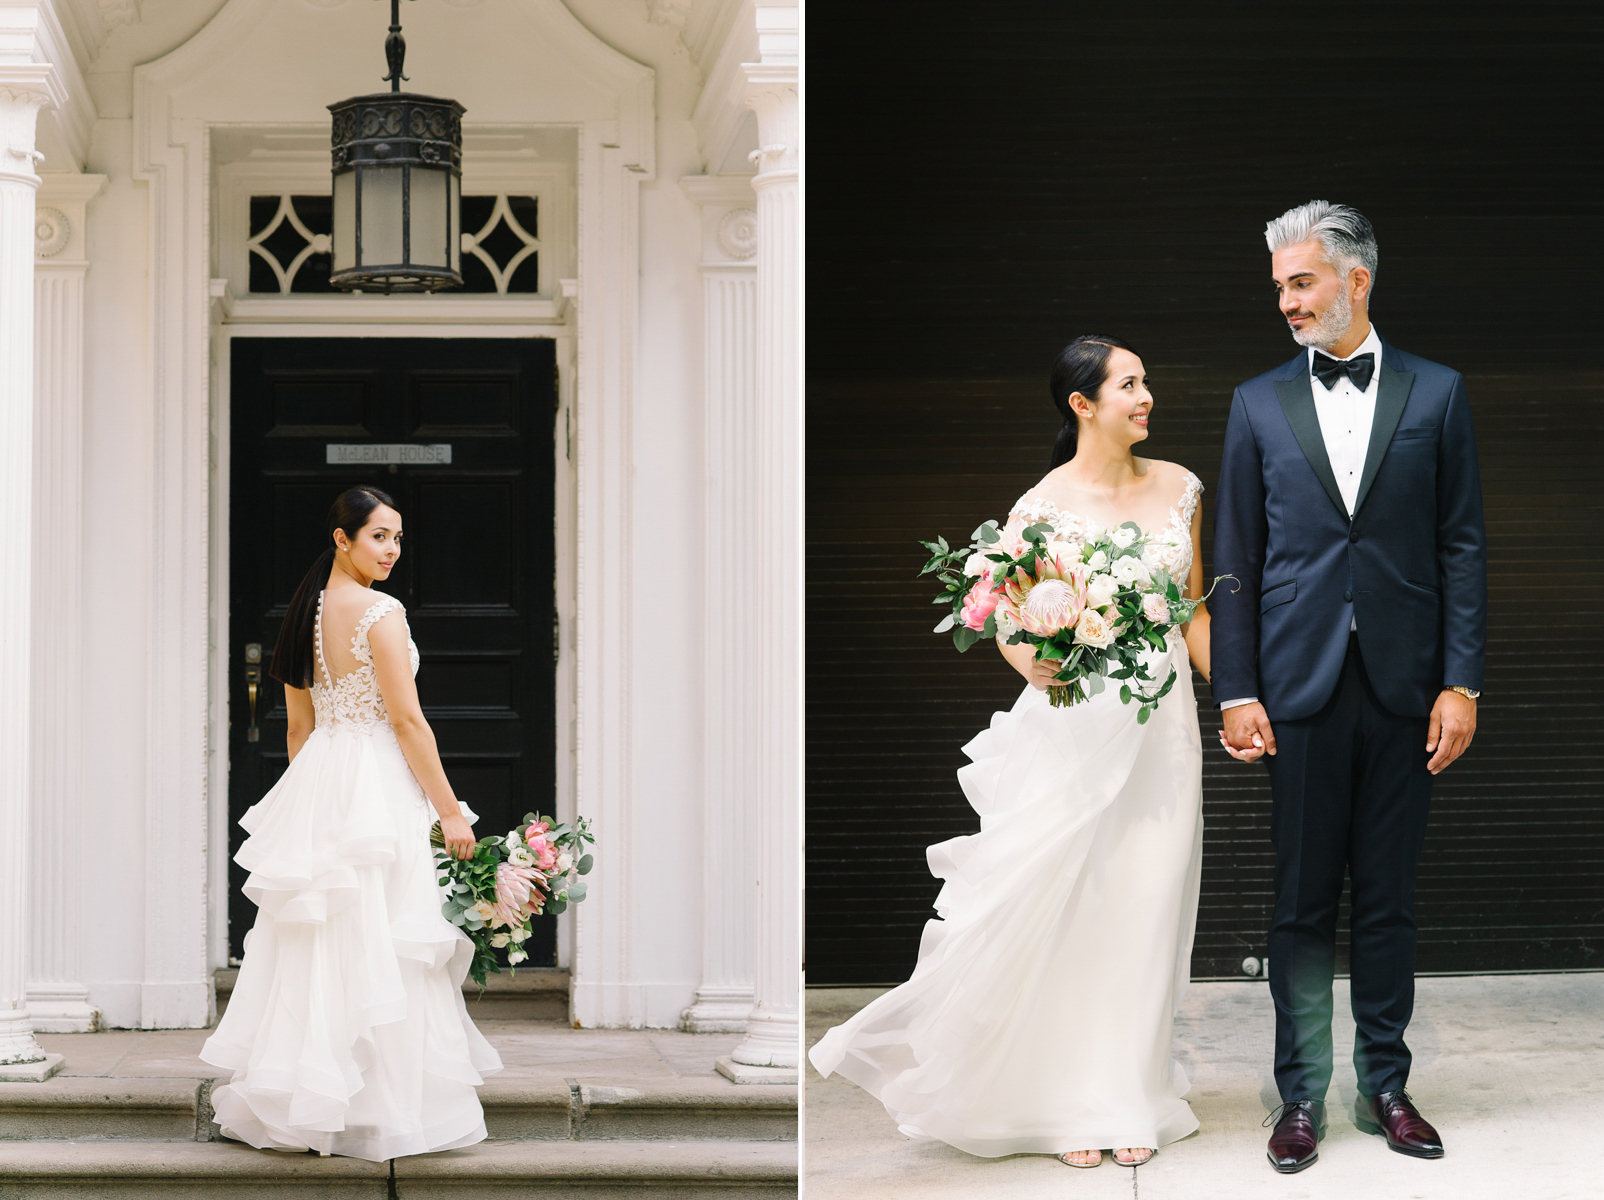 tara-mcmullen-photography-barb-simkova-mclean-house-wedding-estates-of-sunnybrook-wedding-shealyn-angus-wedding-blush-and-bloom-wedding-010